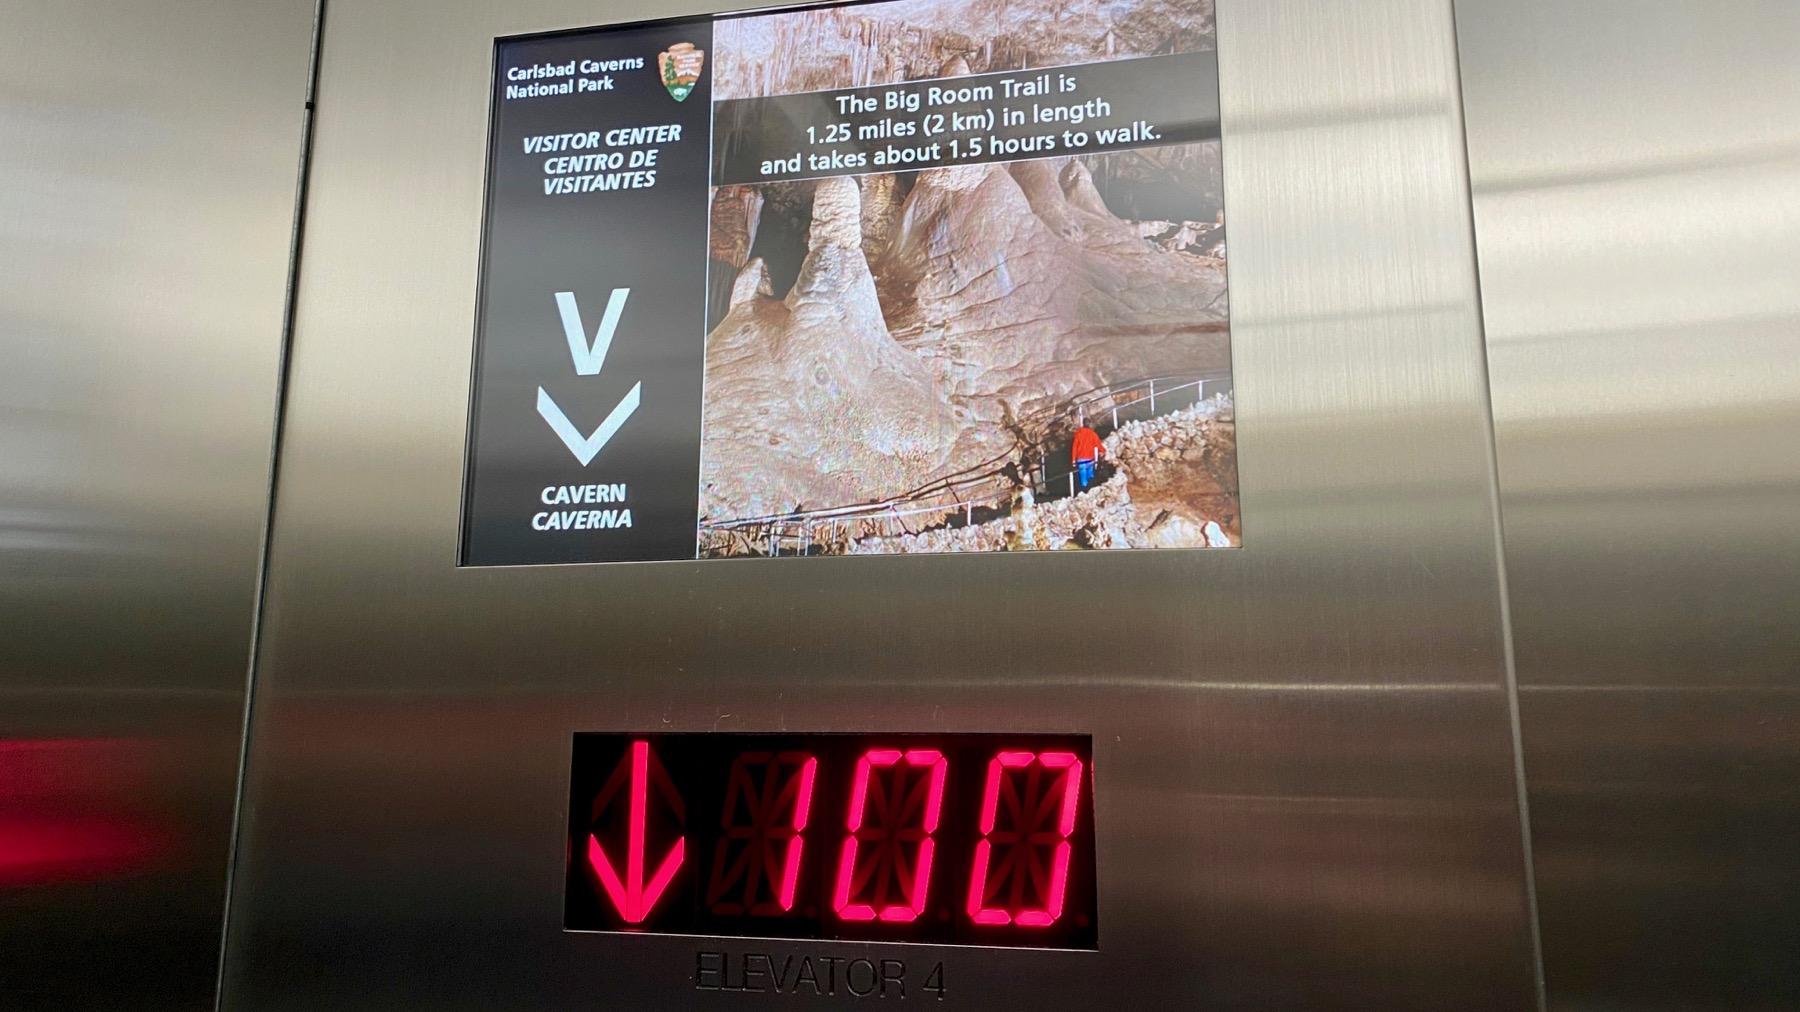 Elevator4down